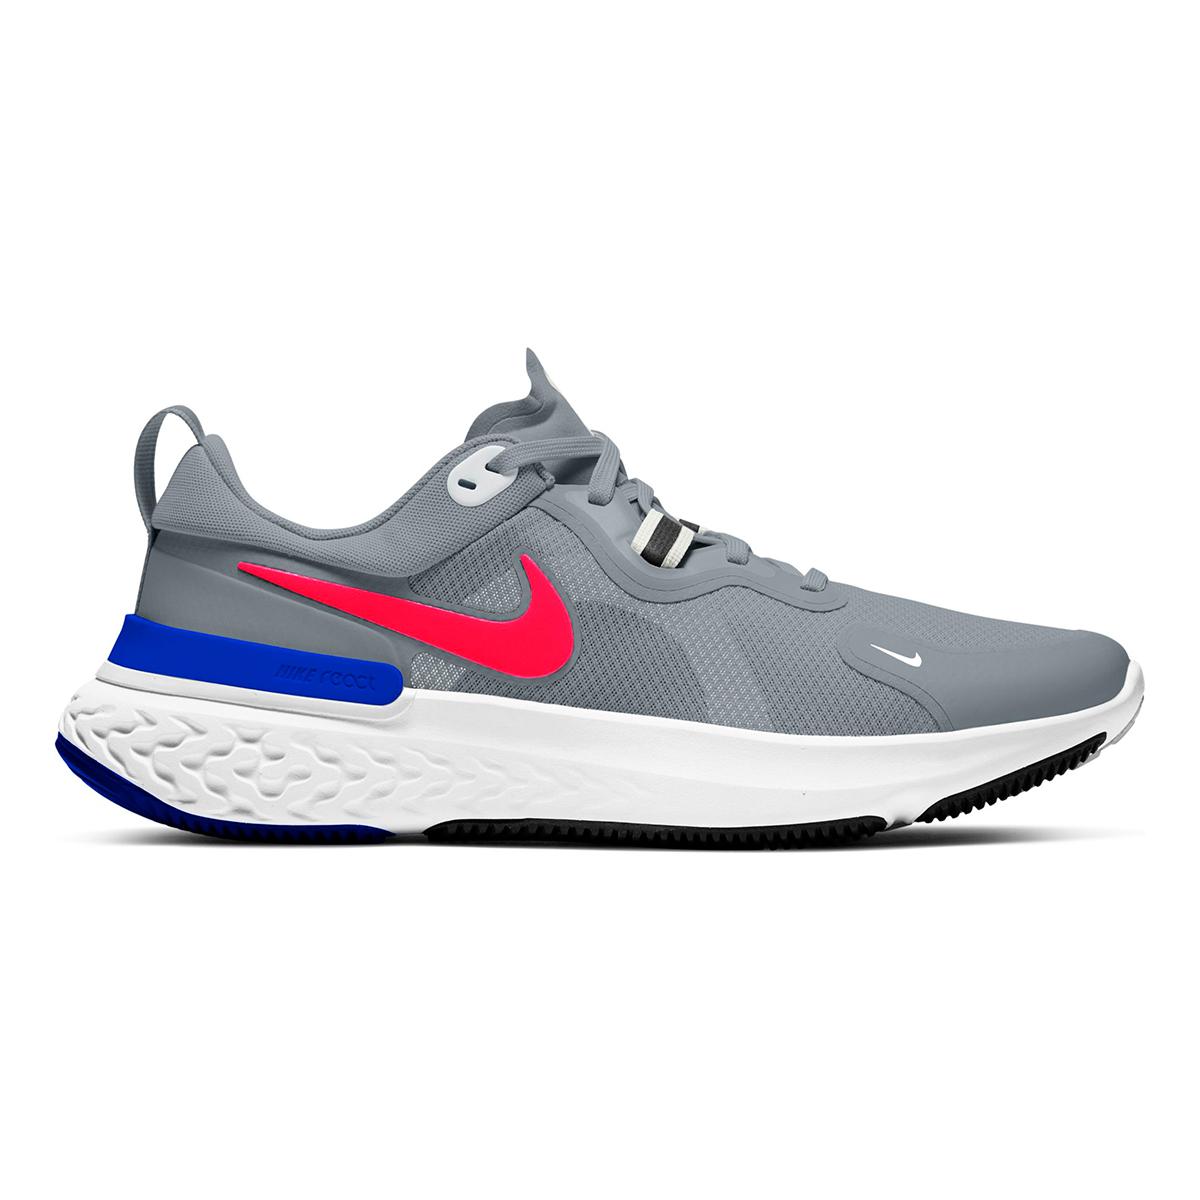 Men's Nike React Miler Running Shoe - Color: Pure Platinum/Racer Blue/Platinum Tint/Bright Crimson - Size: 6 - Width: Regular, Pure Platinum/Racer Blue/Platinum Tint/Bright Crimson, large, image 1